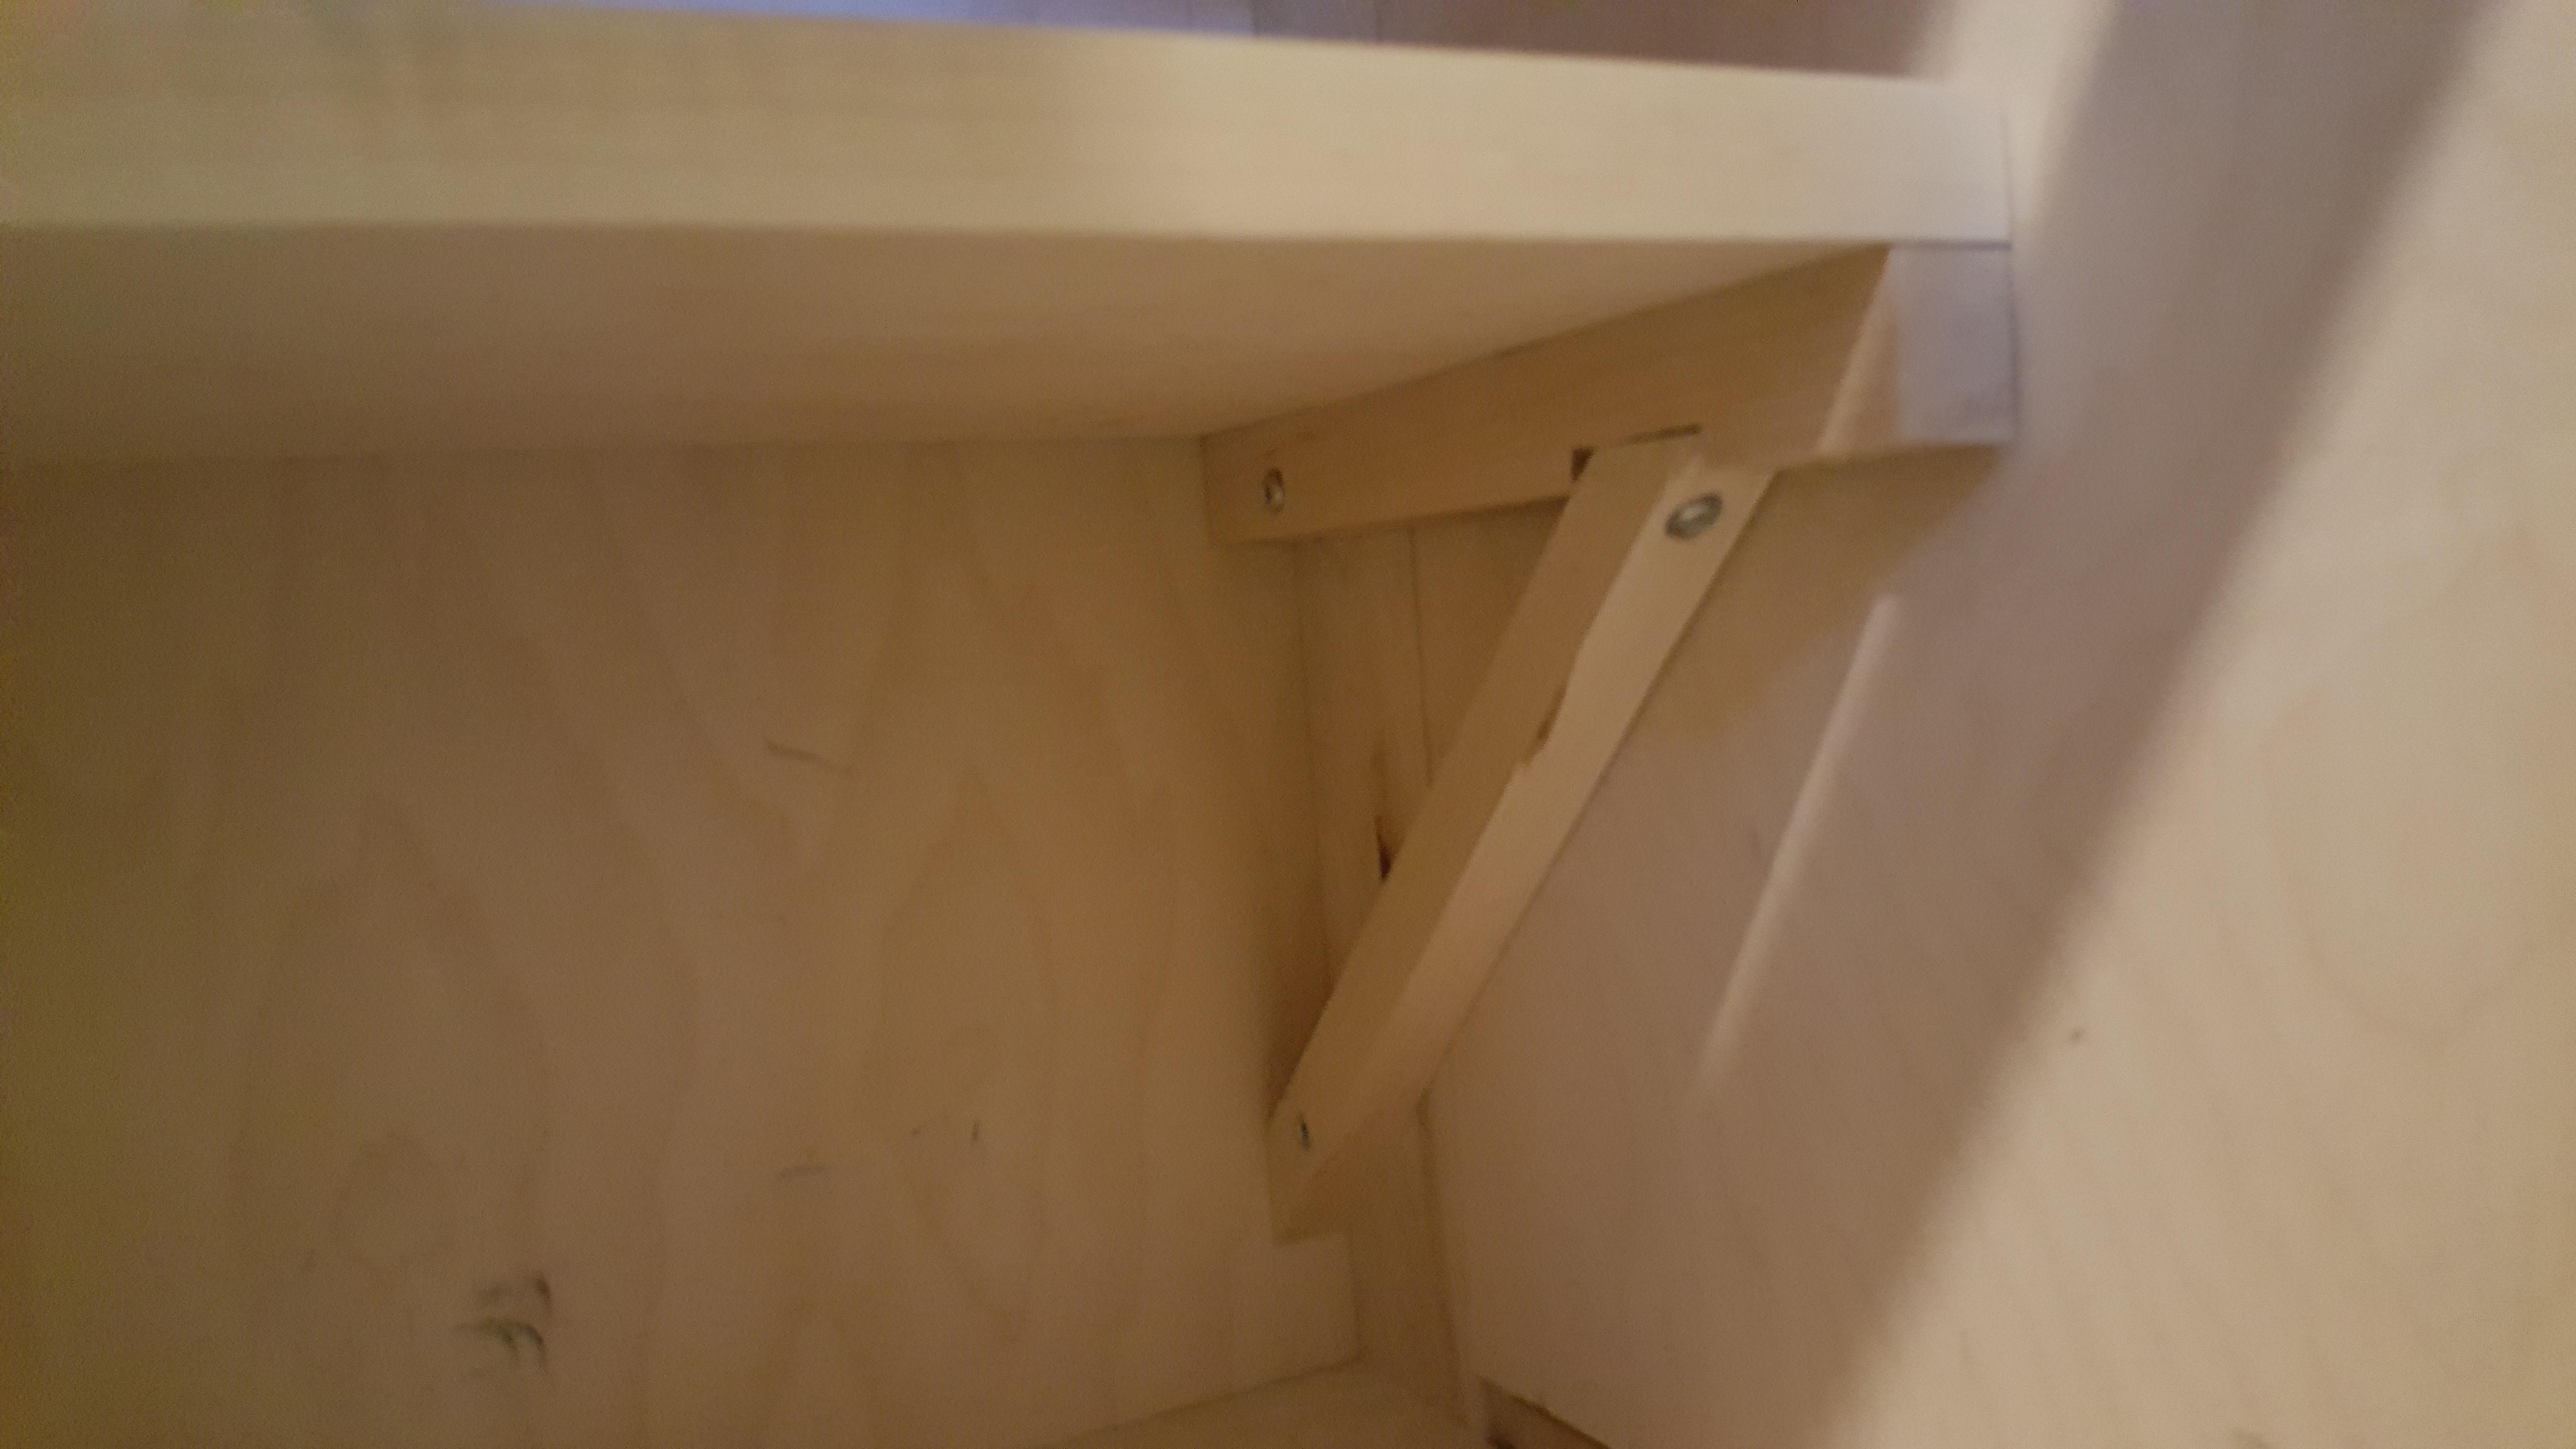 Picture of The Centre Shelf